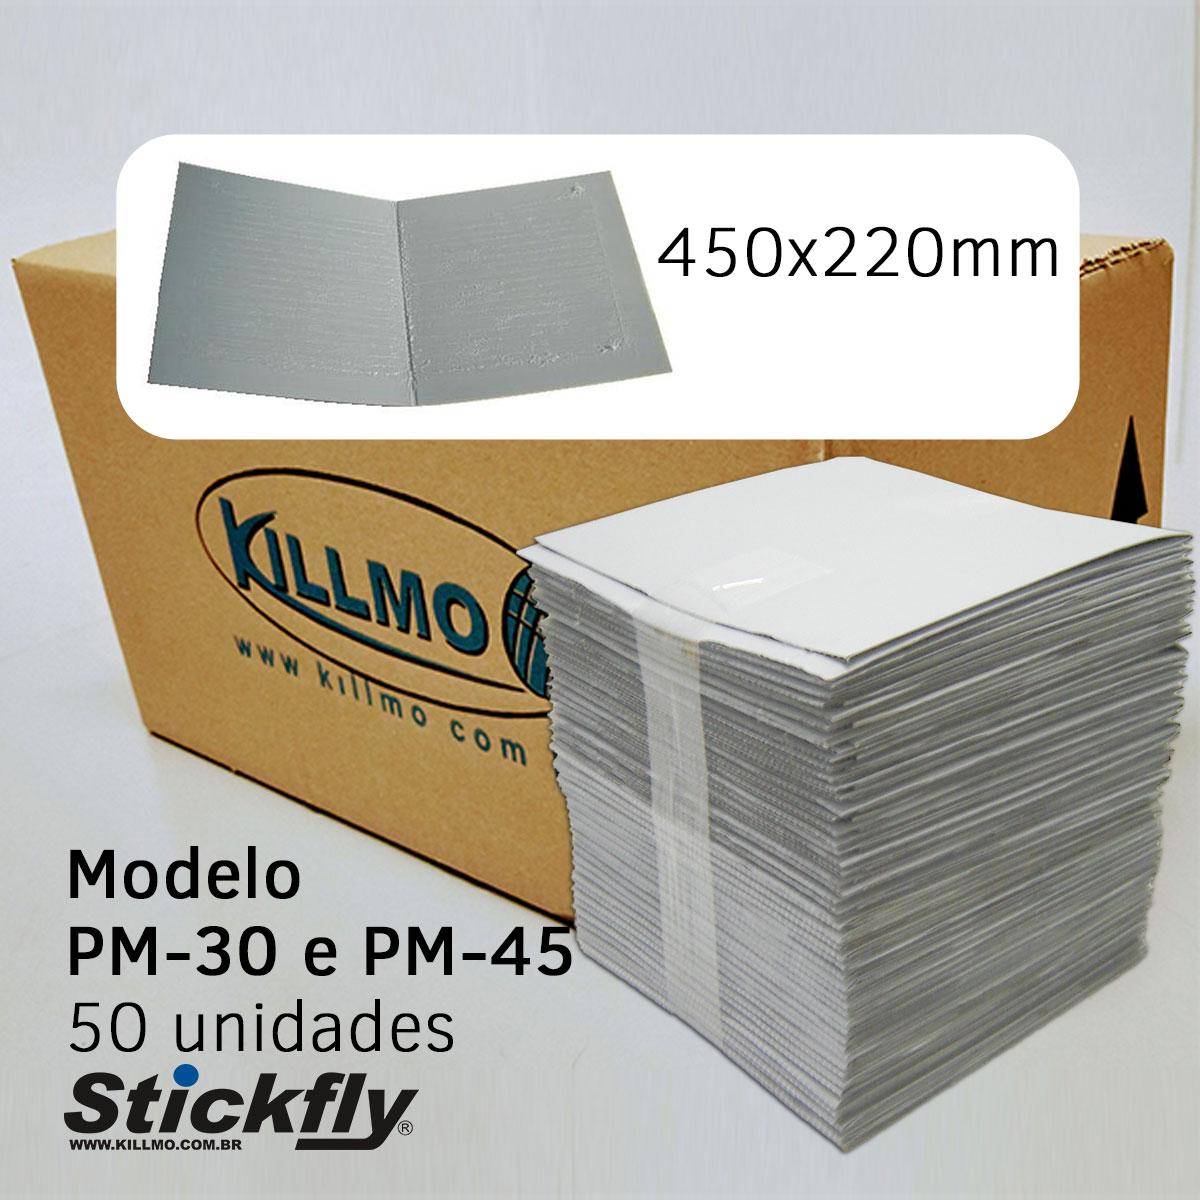 CAIXA 50 UNIDADES REFIL ADESIVO ARMADILHA LUMINOSA 450x220MM STICKFLY PM-30/PM-45